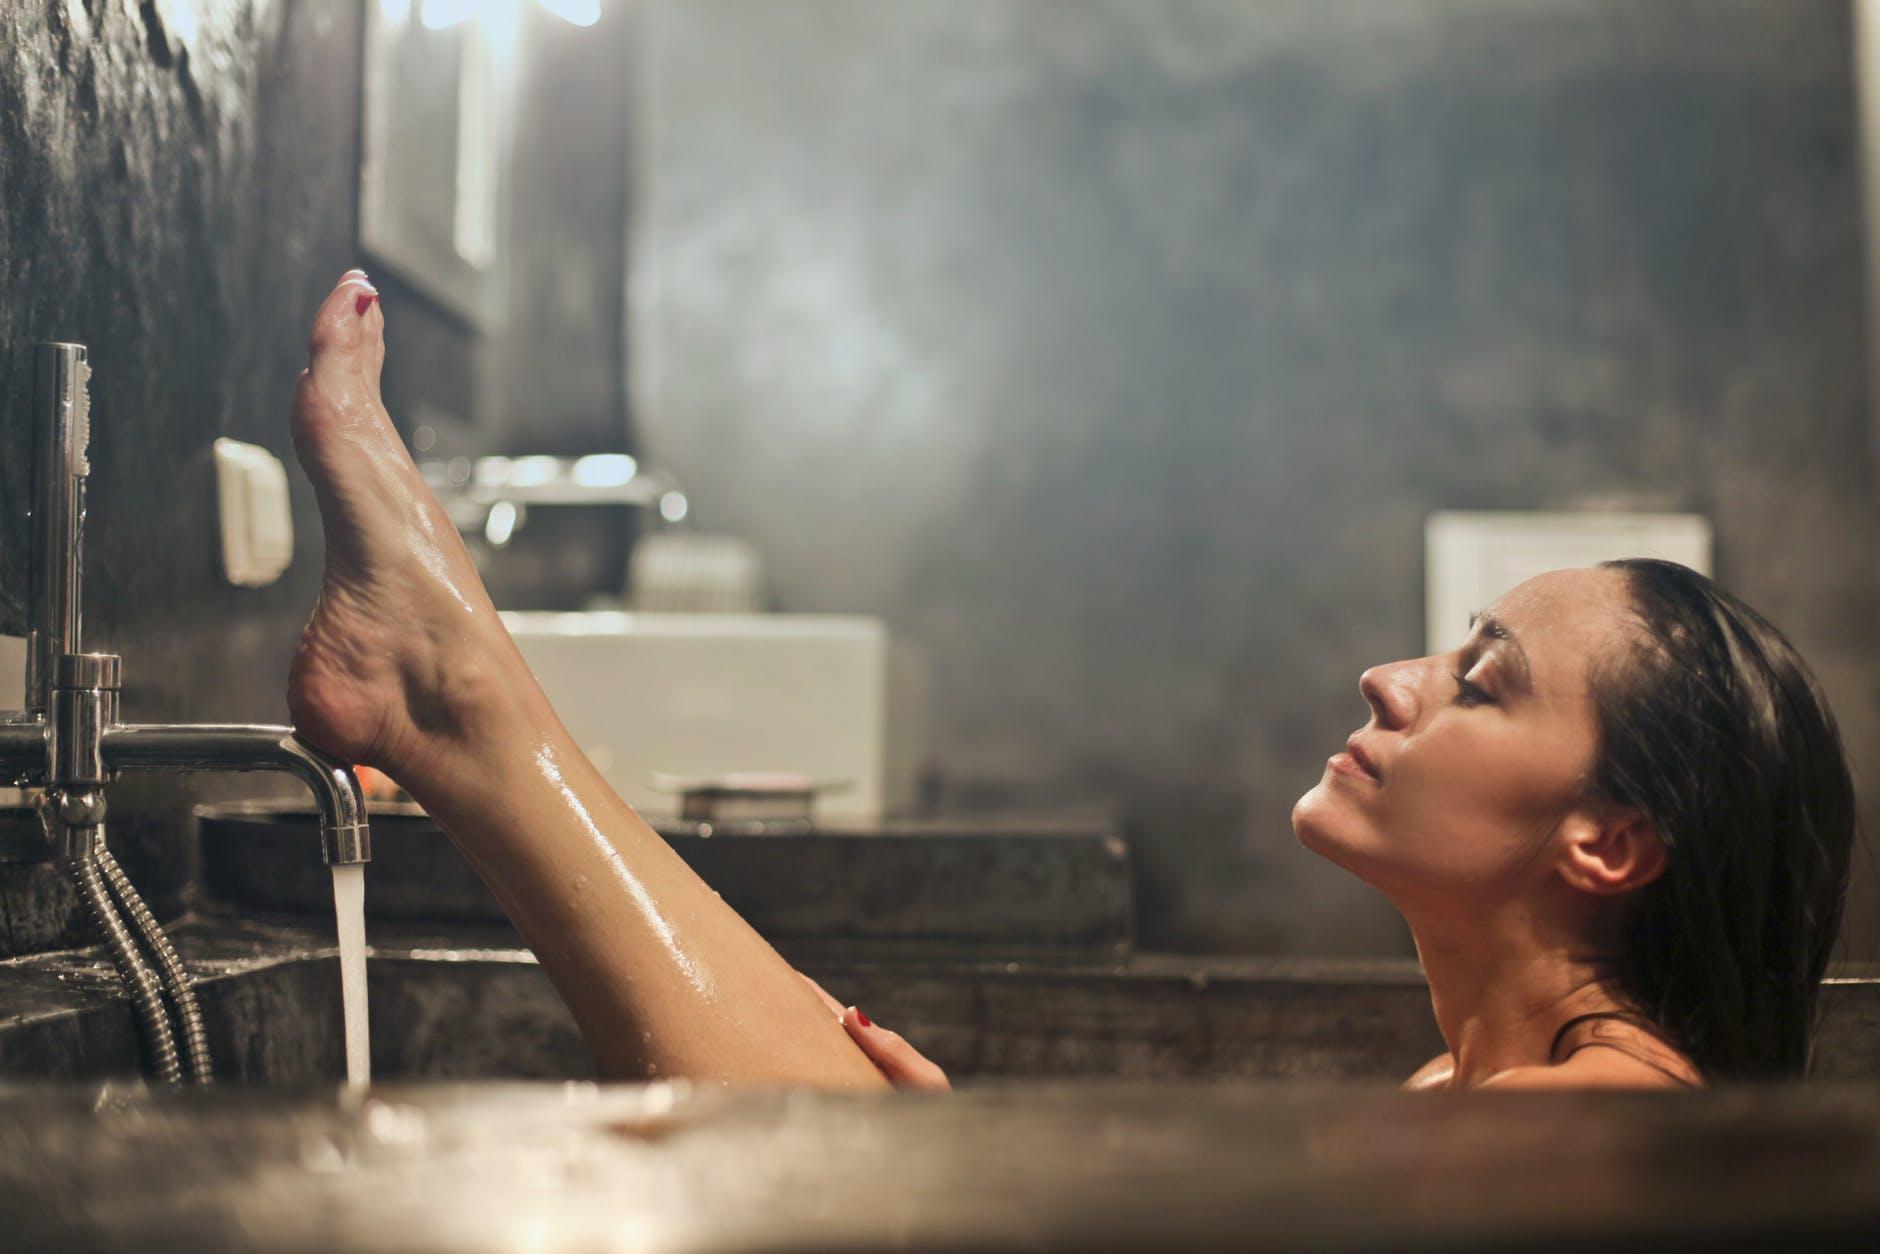 woman having a bath using a water heater